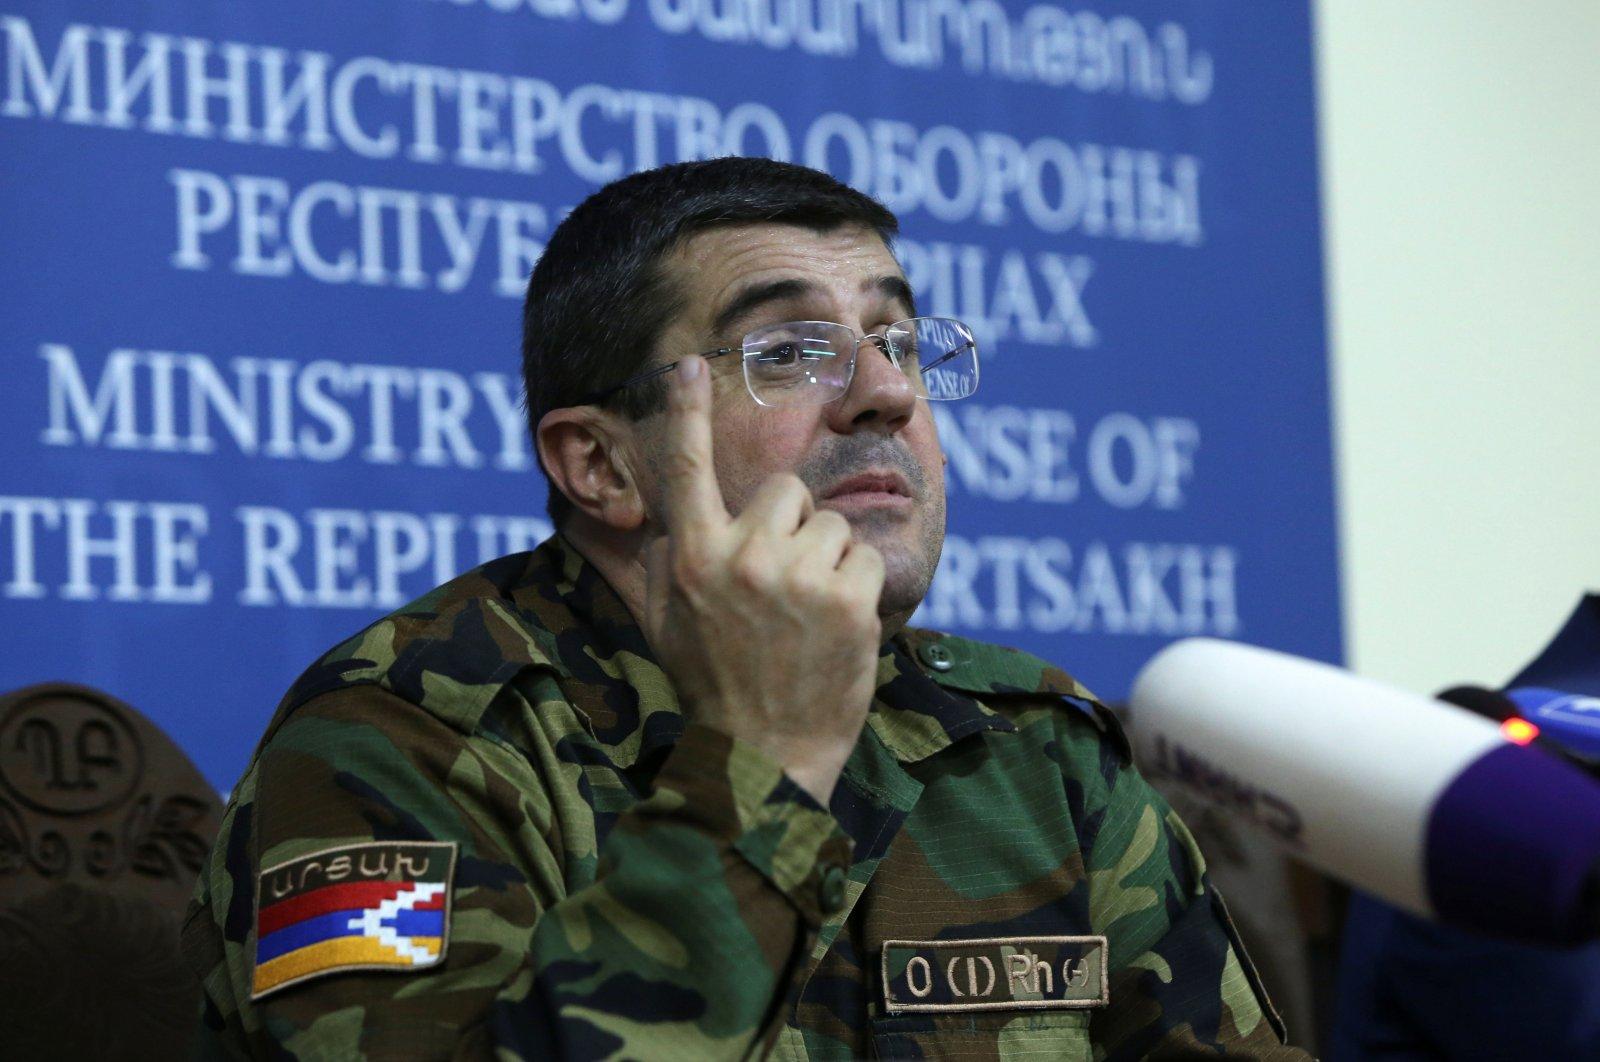 "Arayik Harutyunyan, Armenian separatist leader of Azerbaijan's Nagorno-Karabakh region, attends a news conference in Stepanakert (Khankendi), the so-called capital of the unrecognized ""Republic of Artsakh,"" Sept. 27, 2020. (Reuters Photo)"